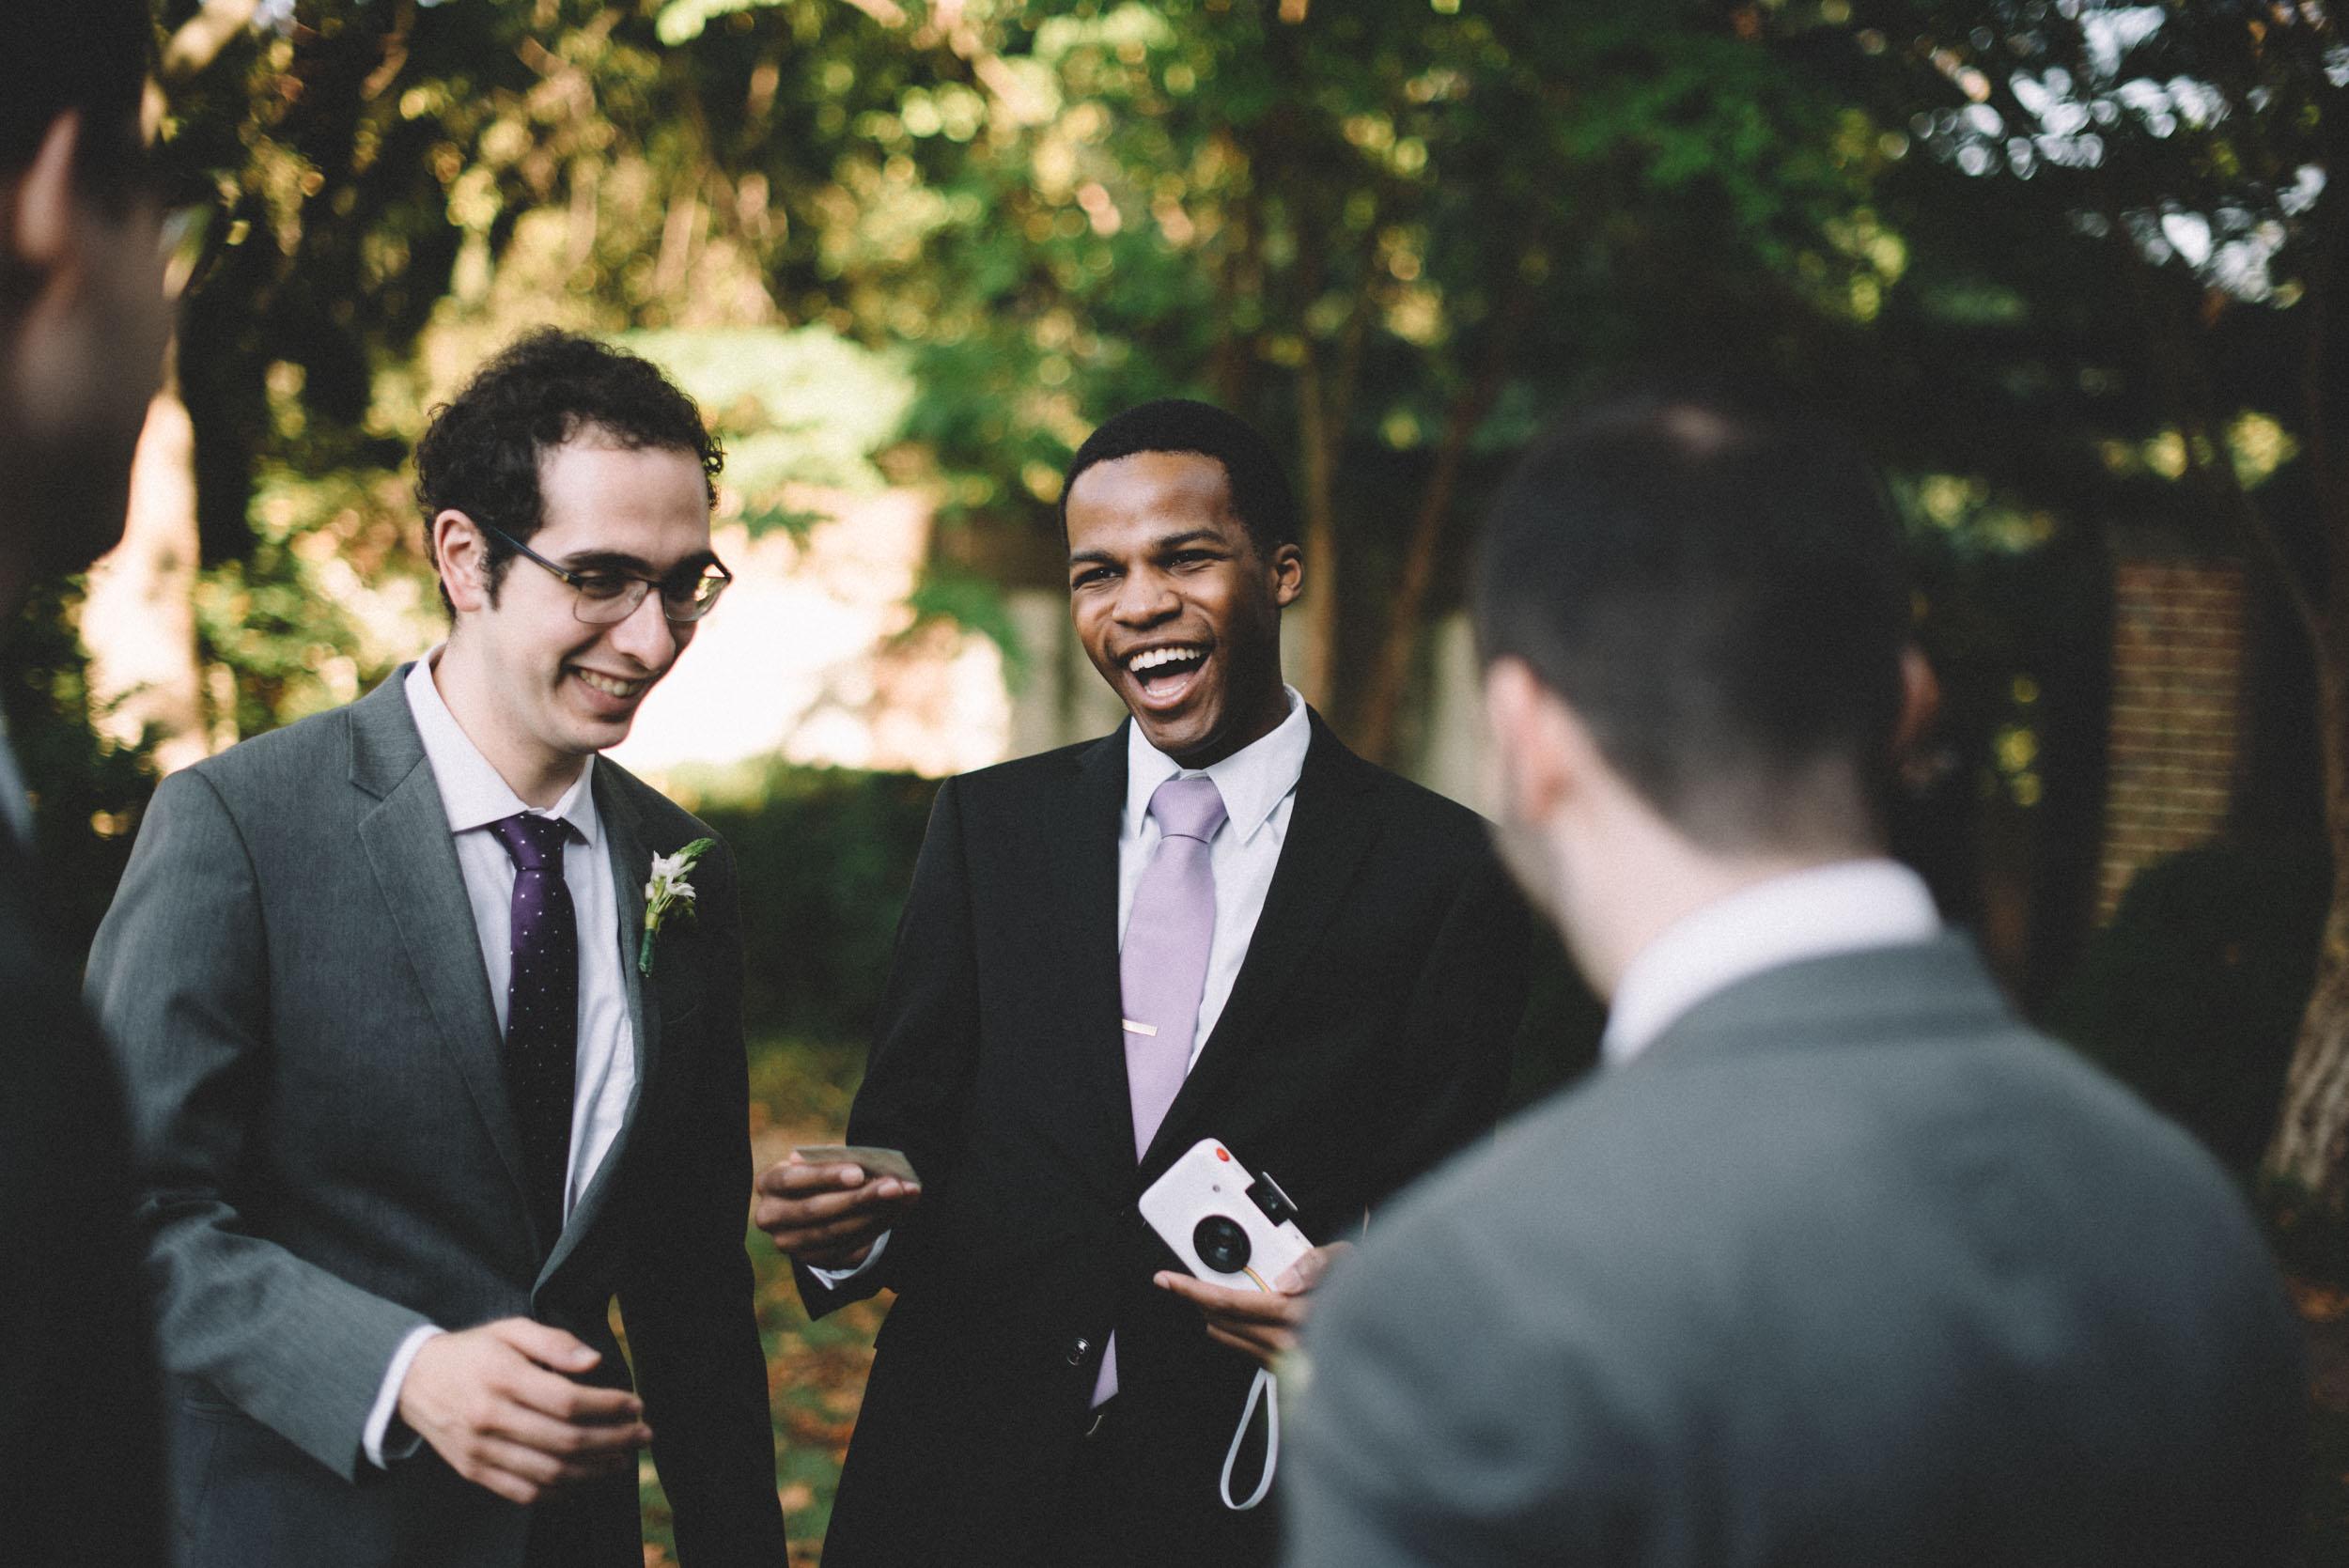 Dumbarton-House-wedding-18.jpg